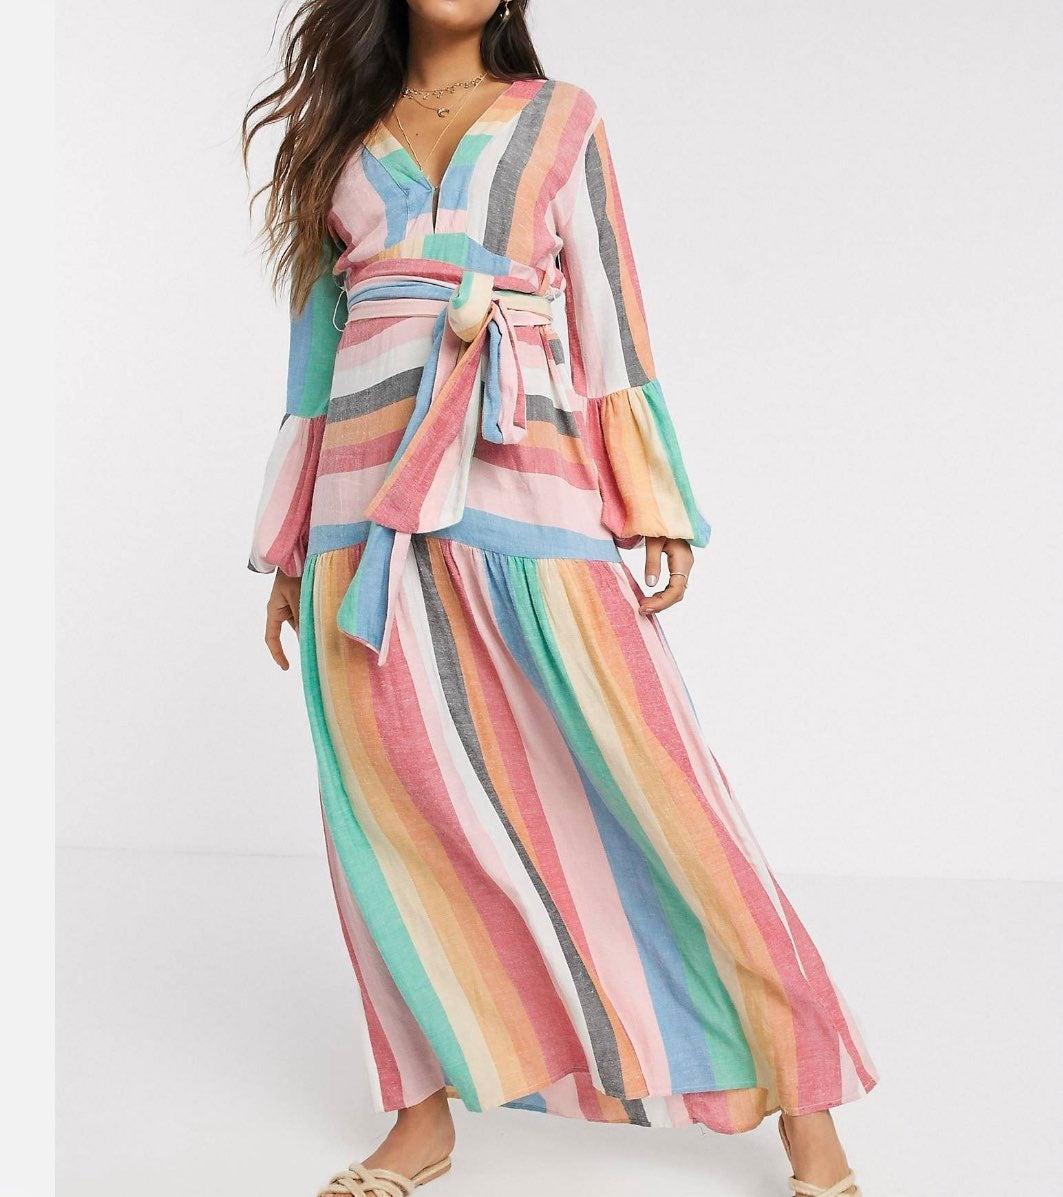 Billabong boho Dress - XS